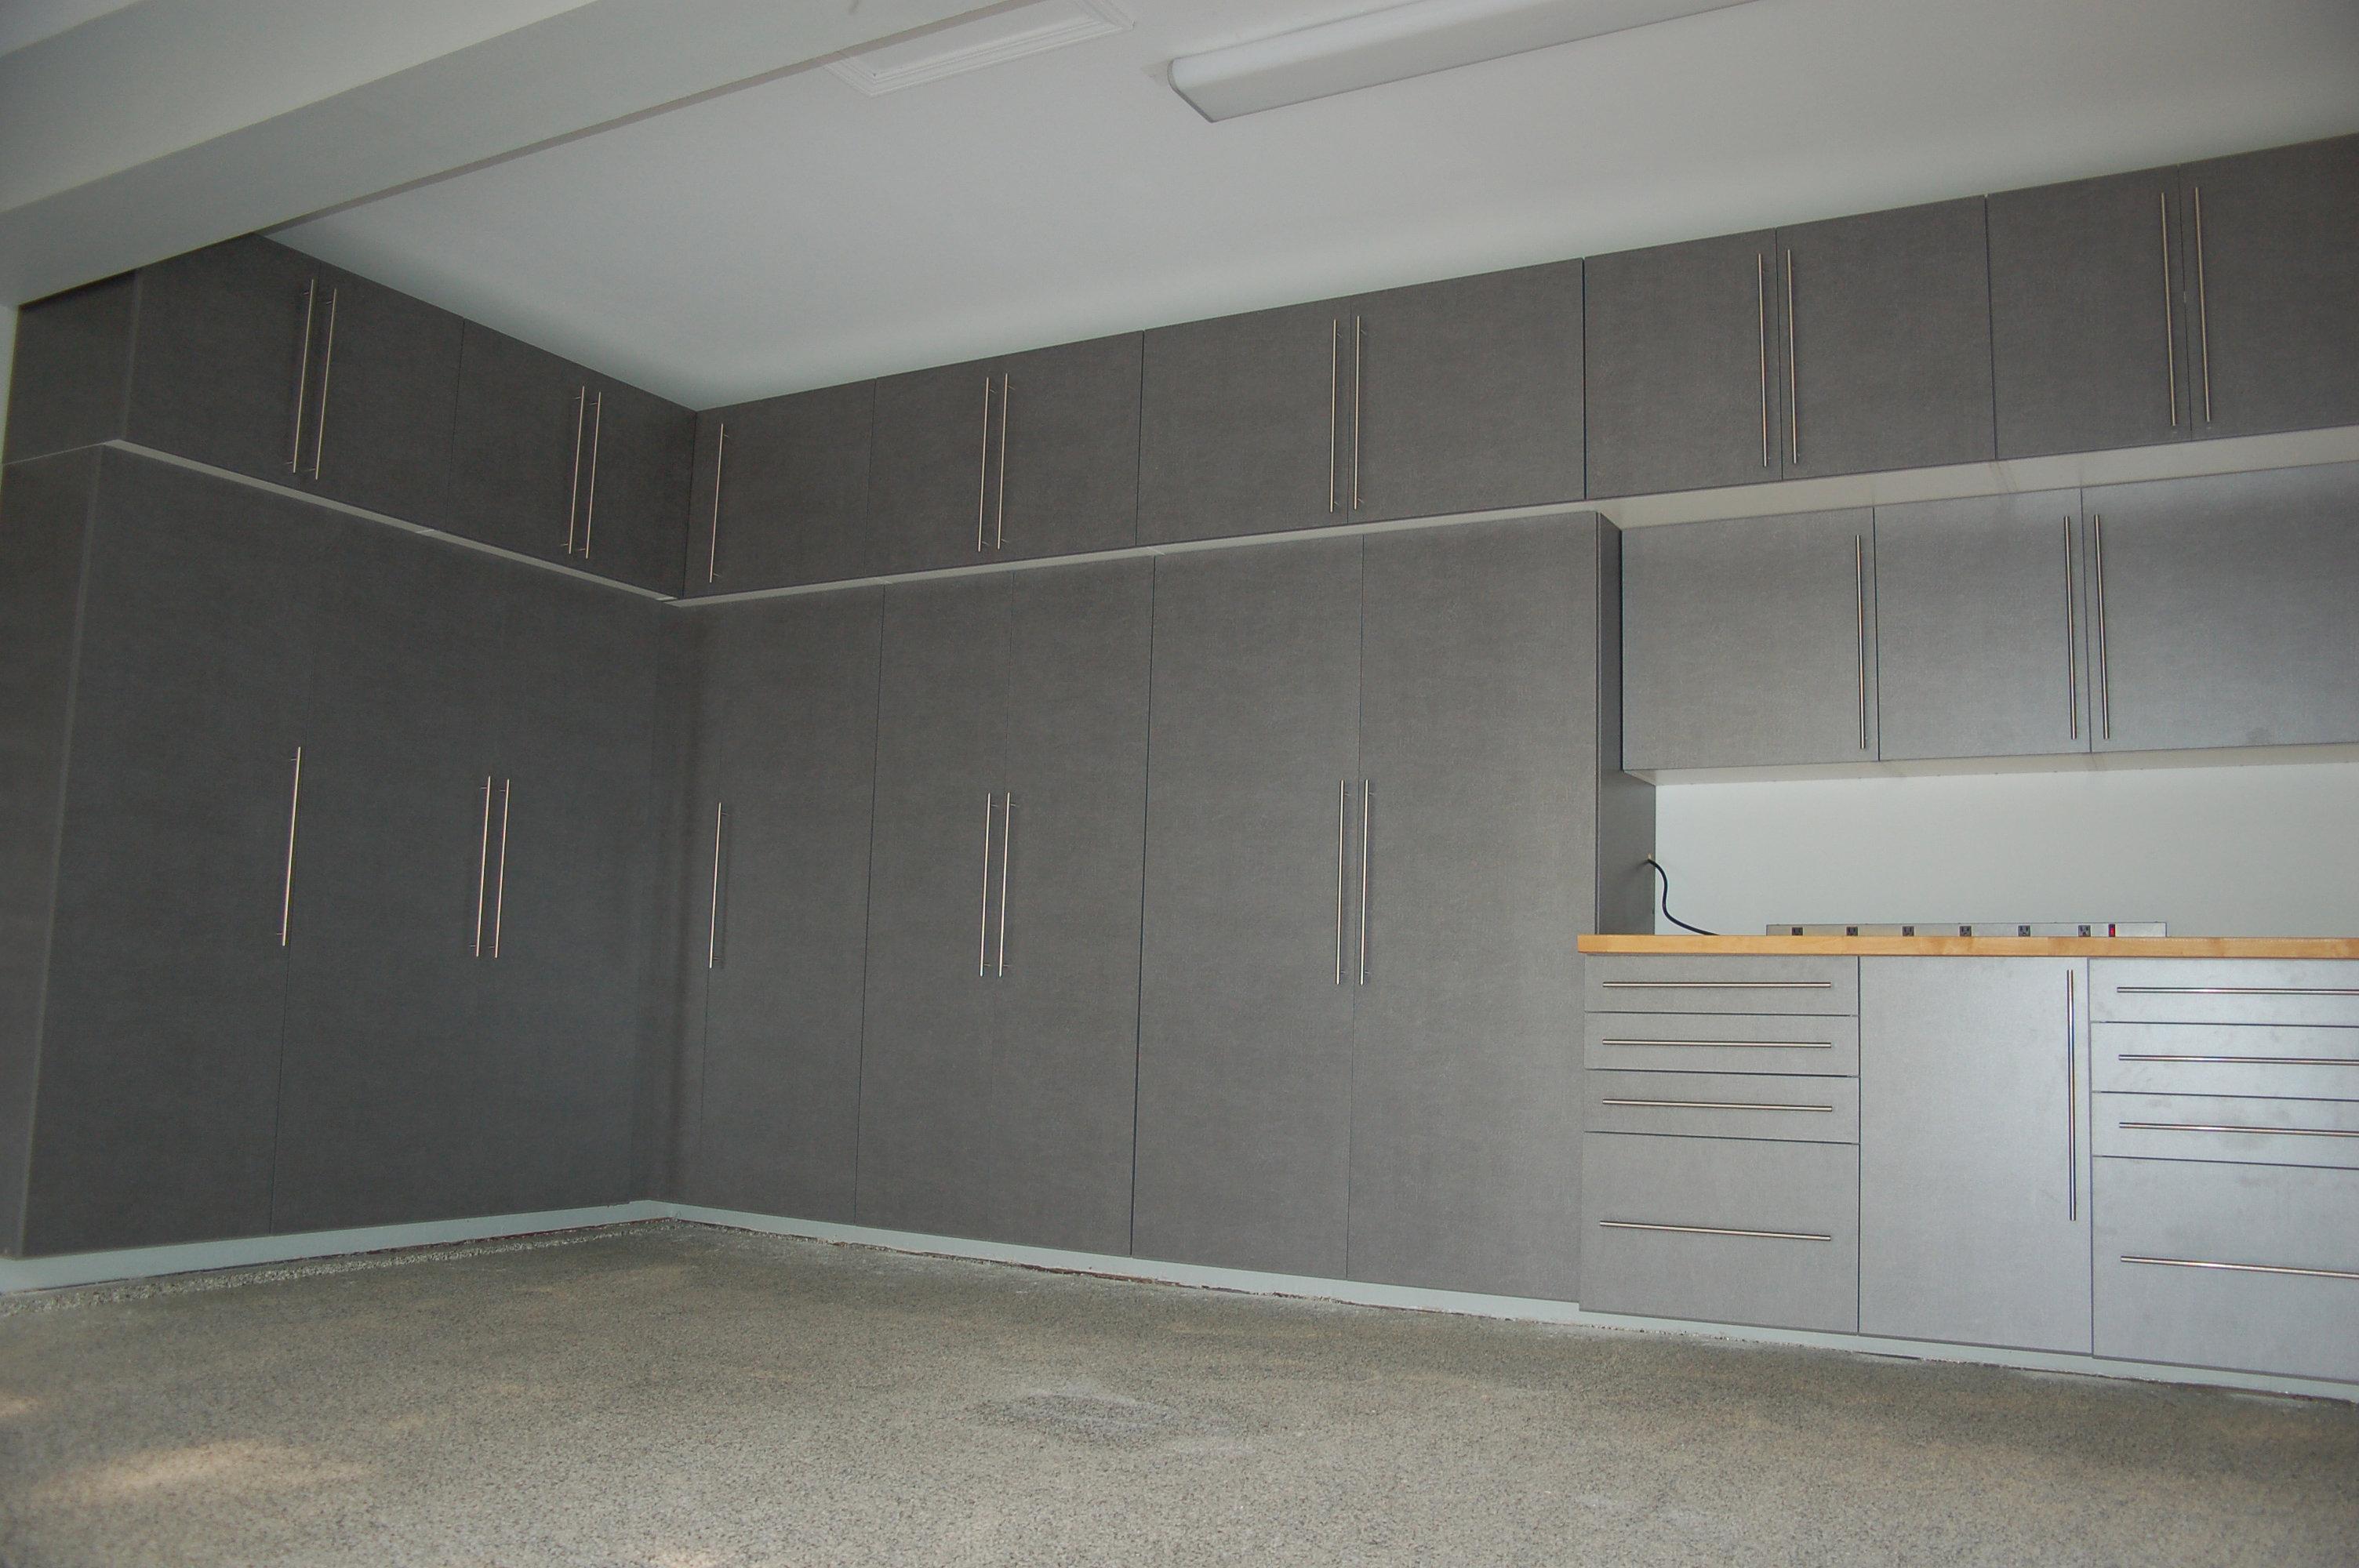 Floor To Ceiling Garage Cabinets Recent Garage Enhancement Projects Garage Cabinets Flooring